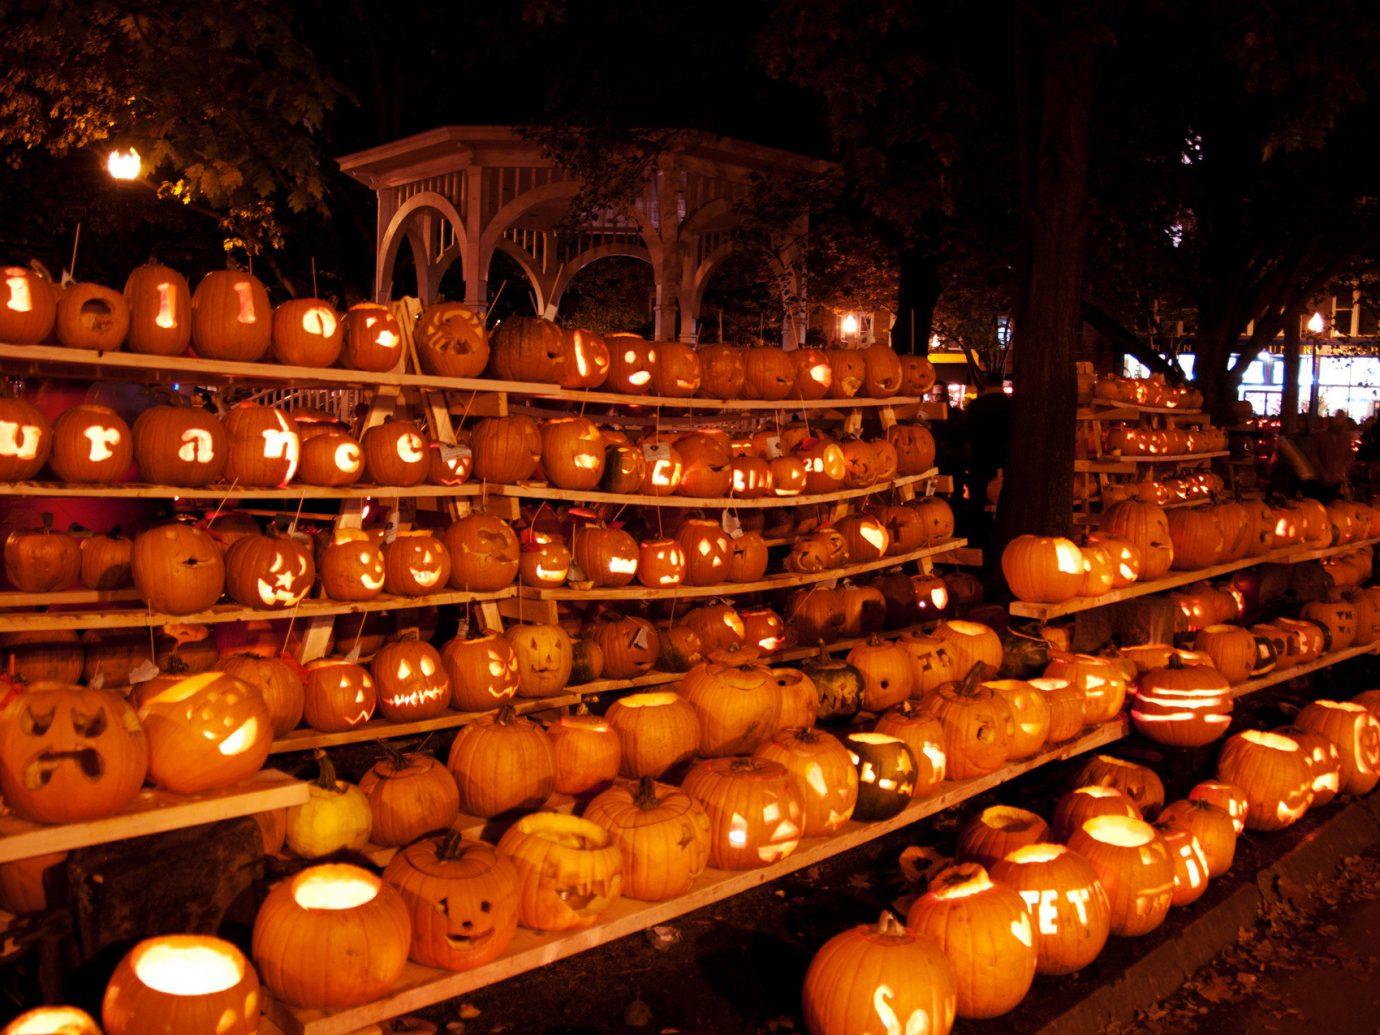 exhibit festive glow halloween holiday lights night night lights pumpkins Trip Ideas outdoor evening bunch several